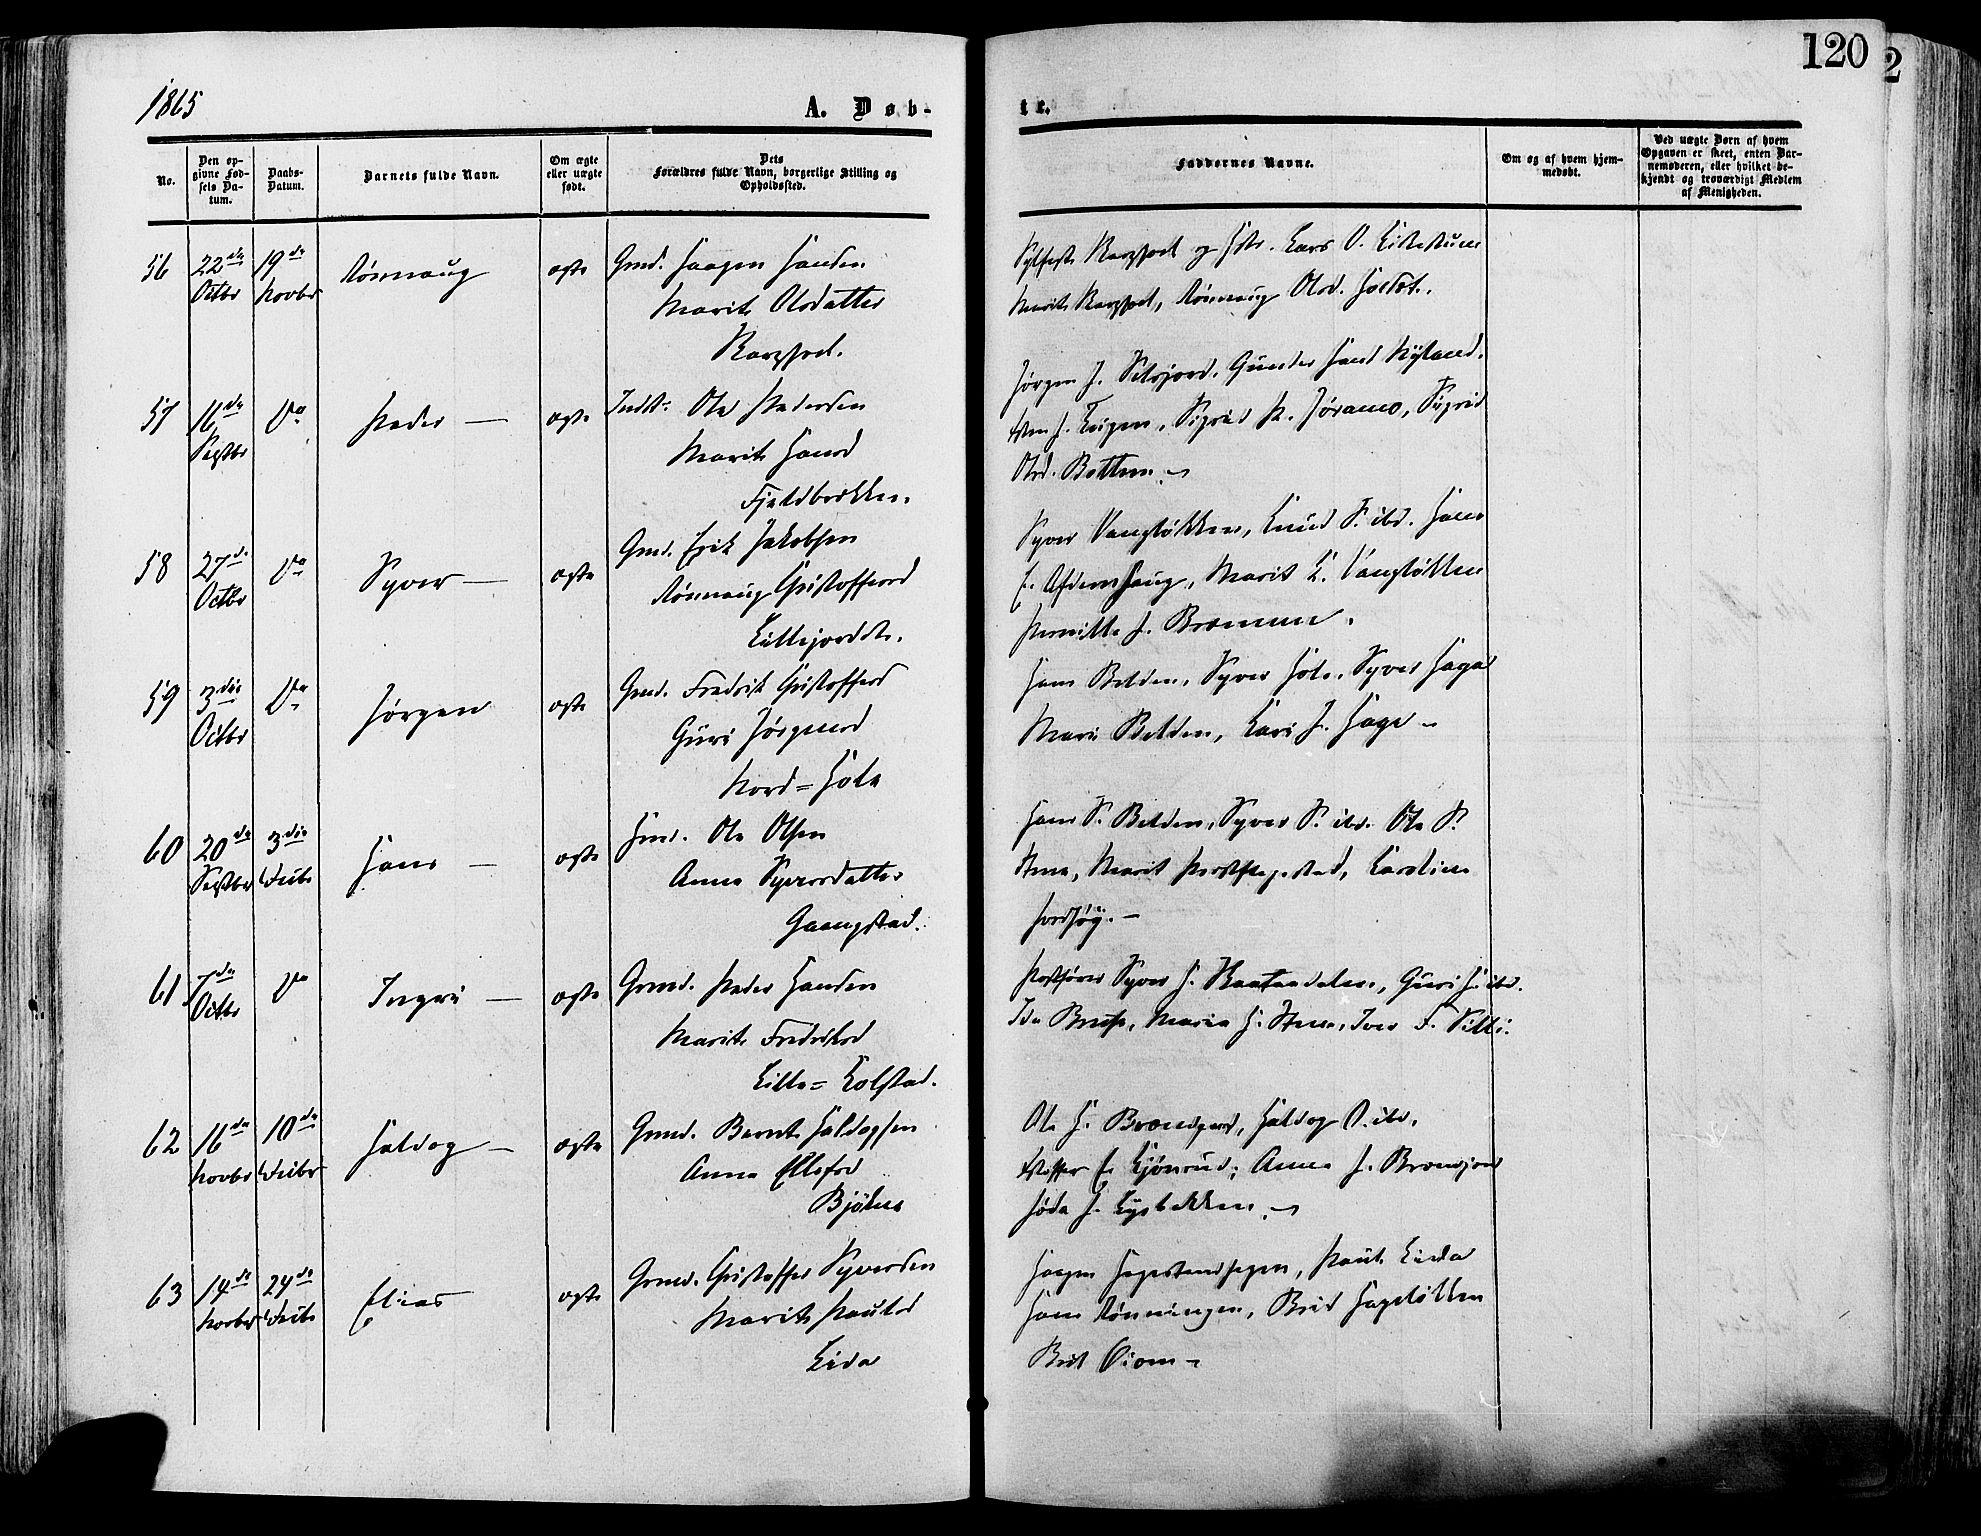 SAH, Lesja prestekontor, Ministerialbok nr. 8, 1854-1880, s. 120